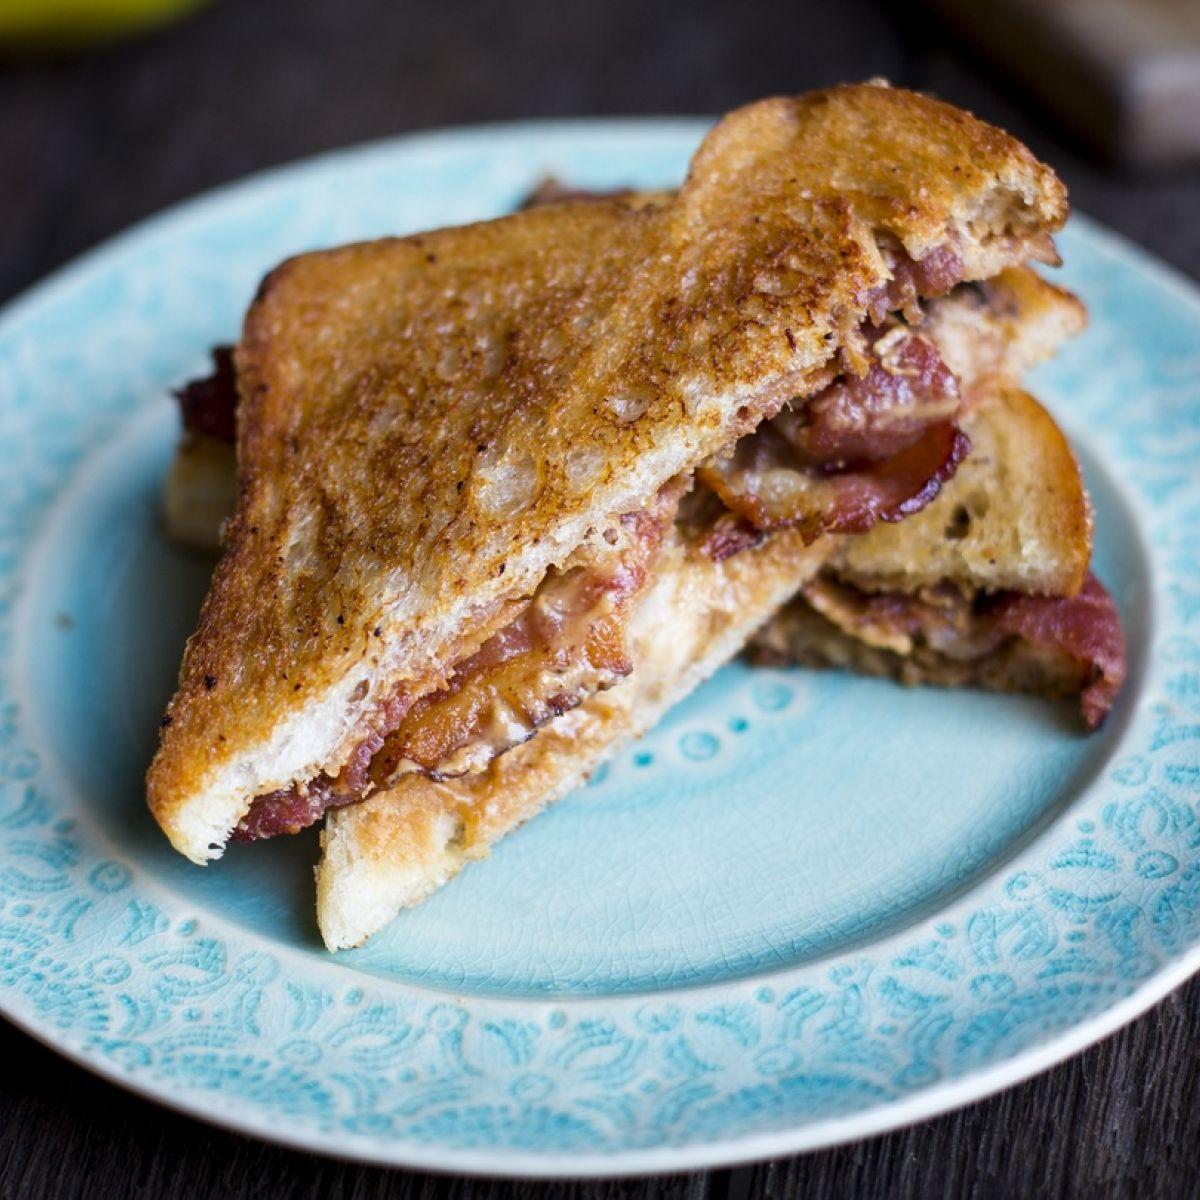 The Elvis Peanut Butter Banana Bacon Sandwich